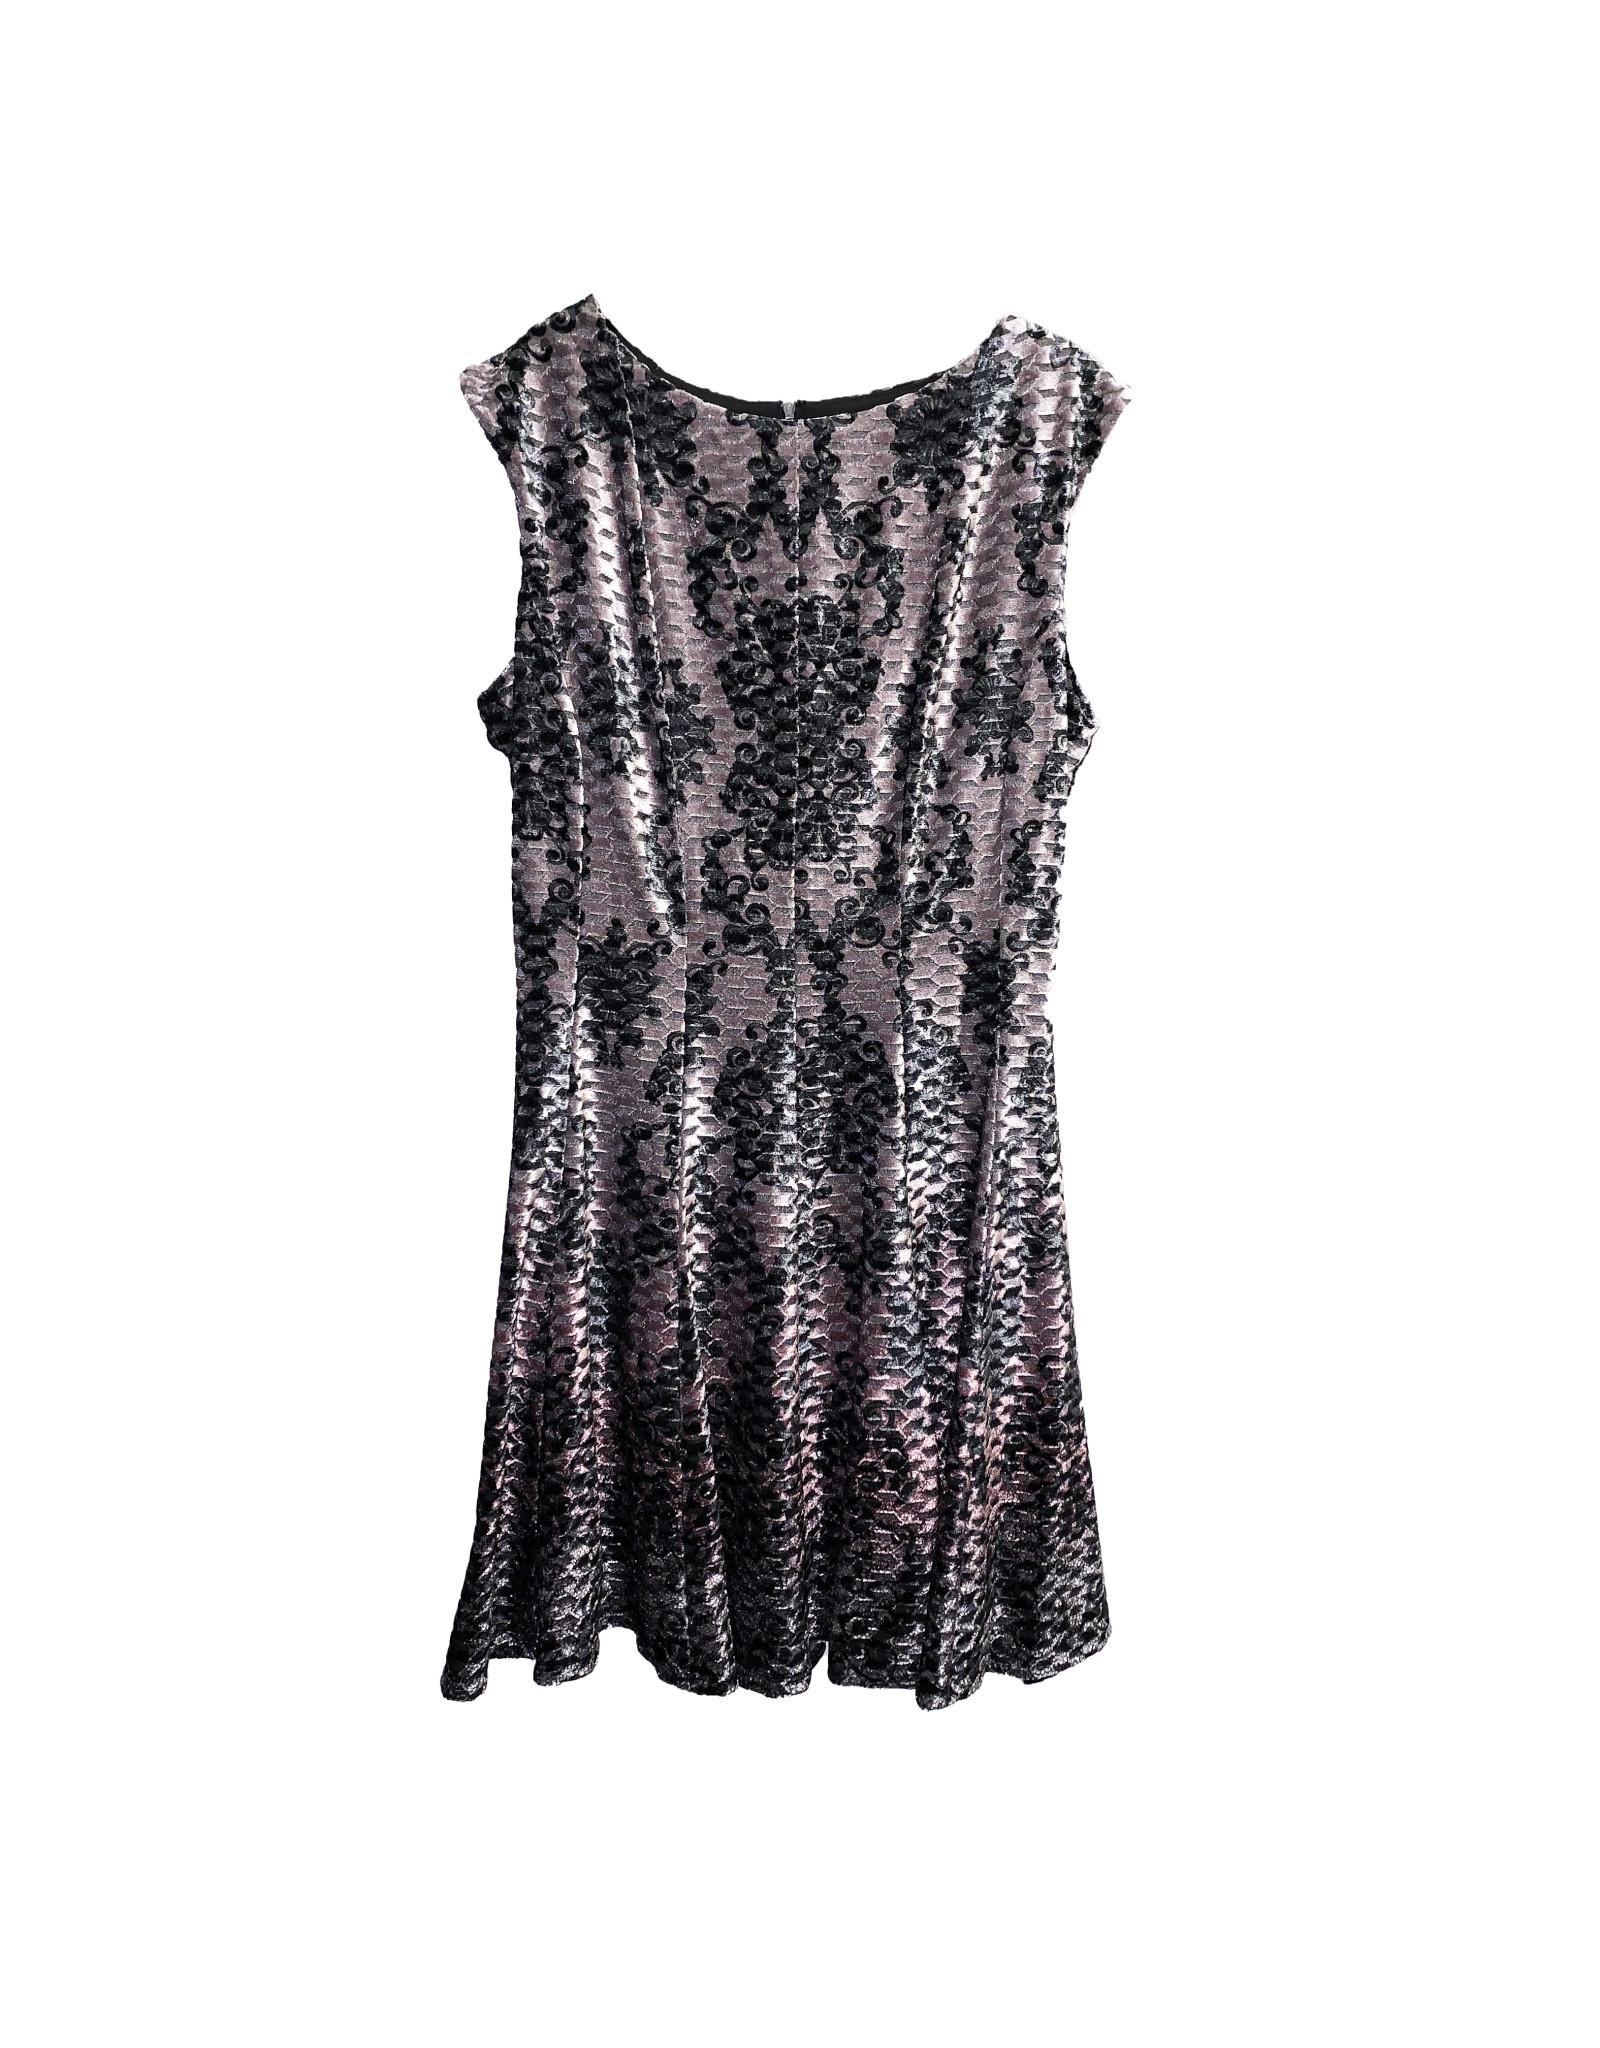 Gabby Skye Gabby Skye Printed Velvet A-Line Dress